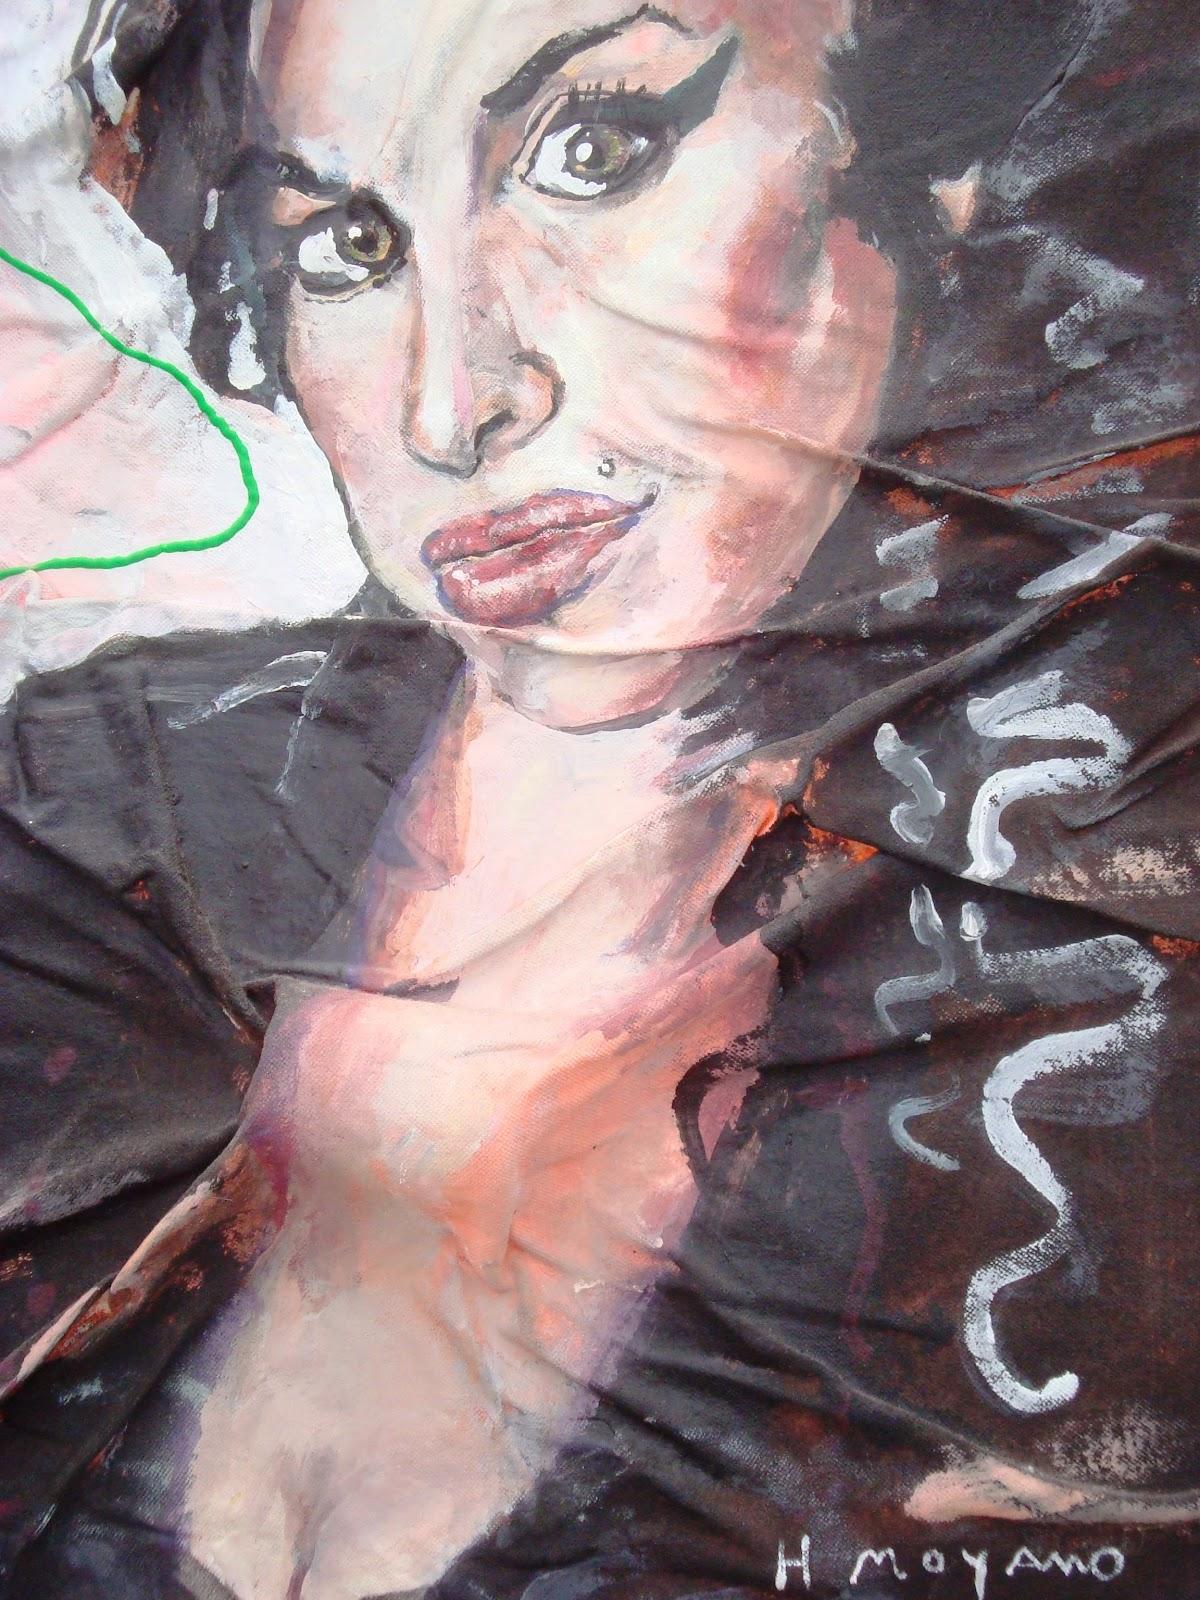 http://2.bp.blogspot.com/-h-JUnMUAsEM/T3mrg1IAfPI/AAAAAAAAAVg/iZwj7r7PXj0/s1600/2.jpg